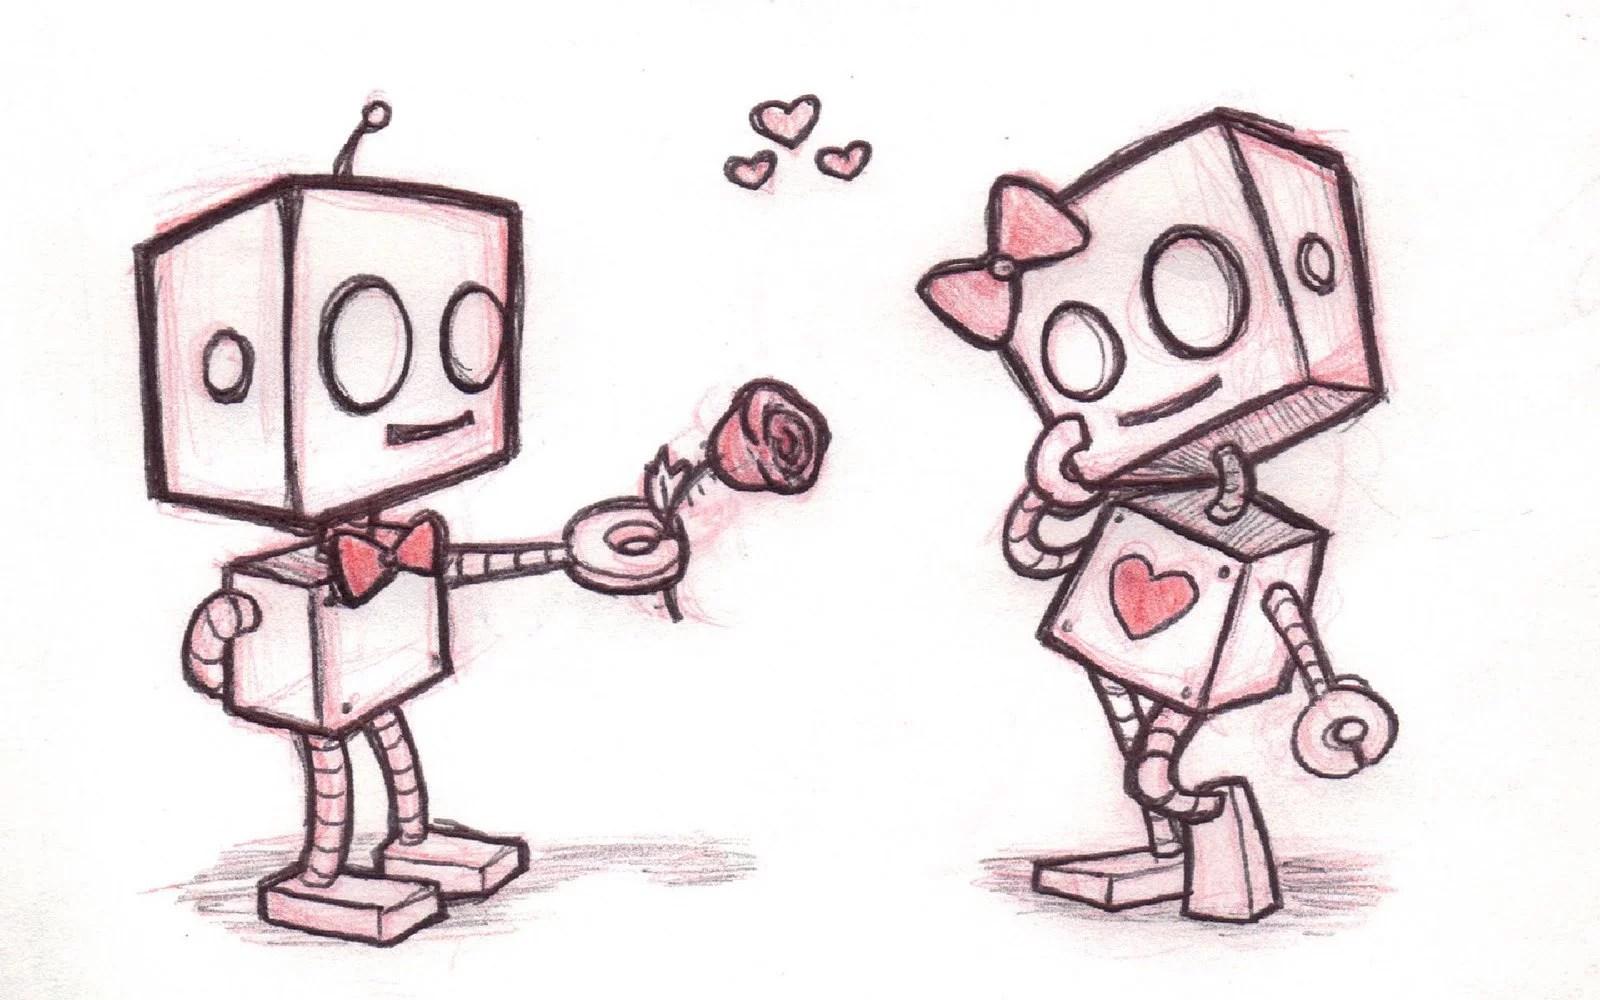 Easy Cute Love Drawings For Your Boyfriend Hd Wallpaper Gallery